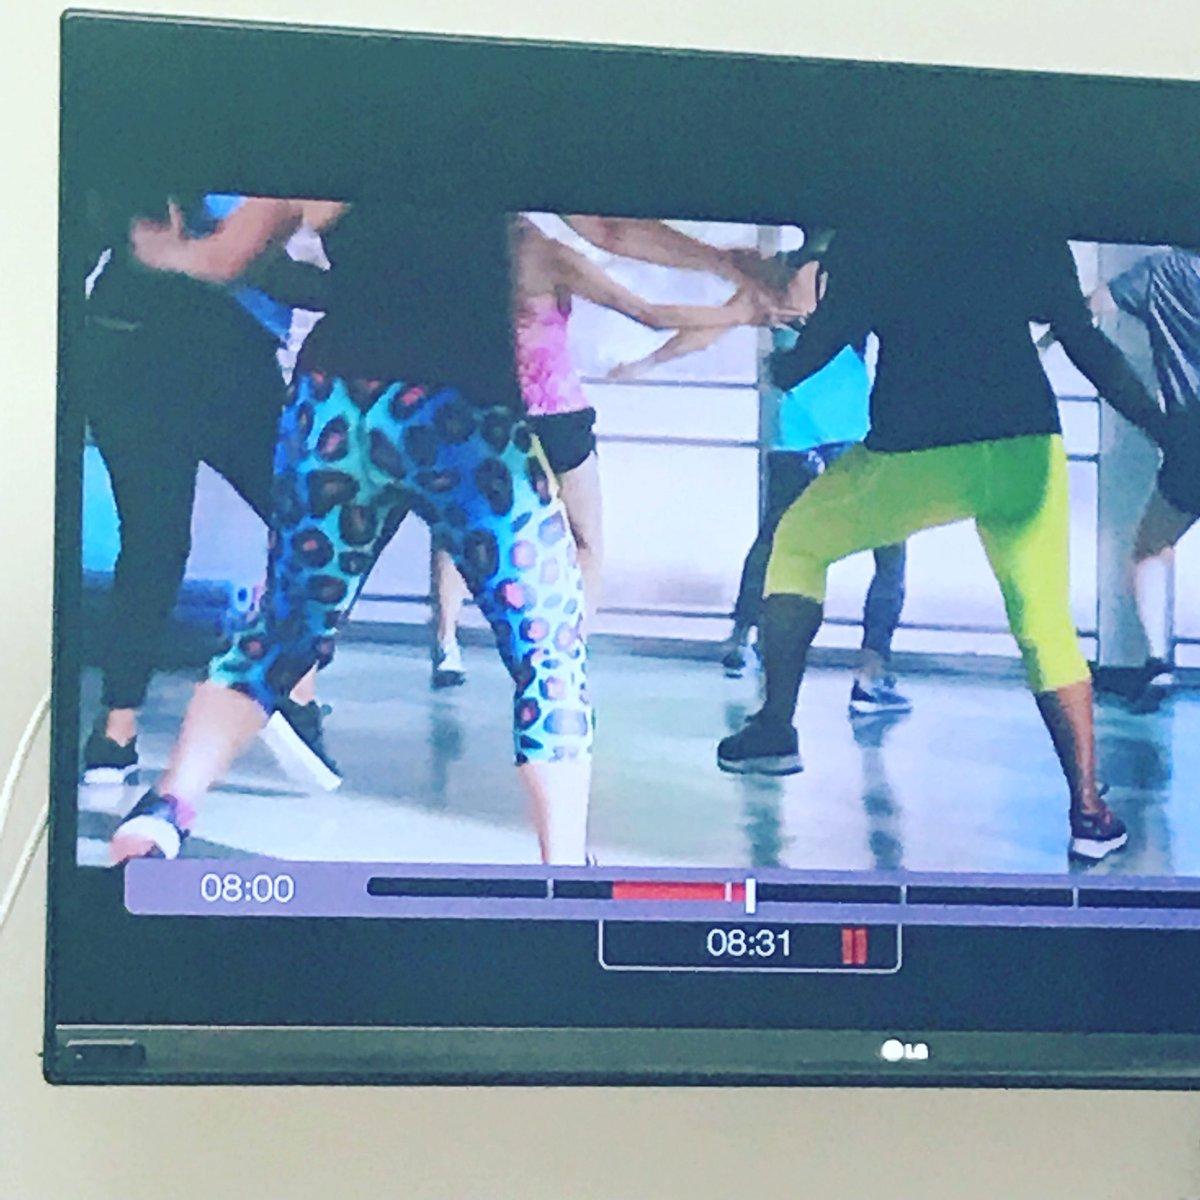 e3fdee354e0cd8 You work them leggings girl, shake your thang! . . . #move #shakeit #dance  #active #activewear #activestyle #gym #aerobics #leggings #leopardprint ...